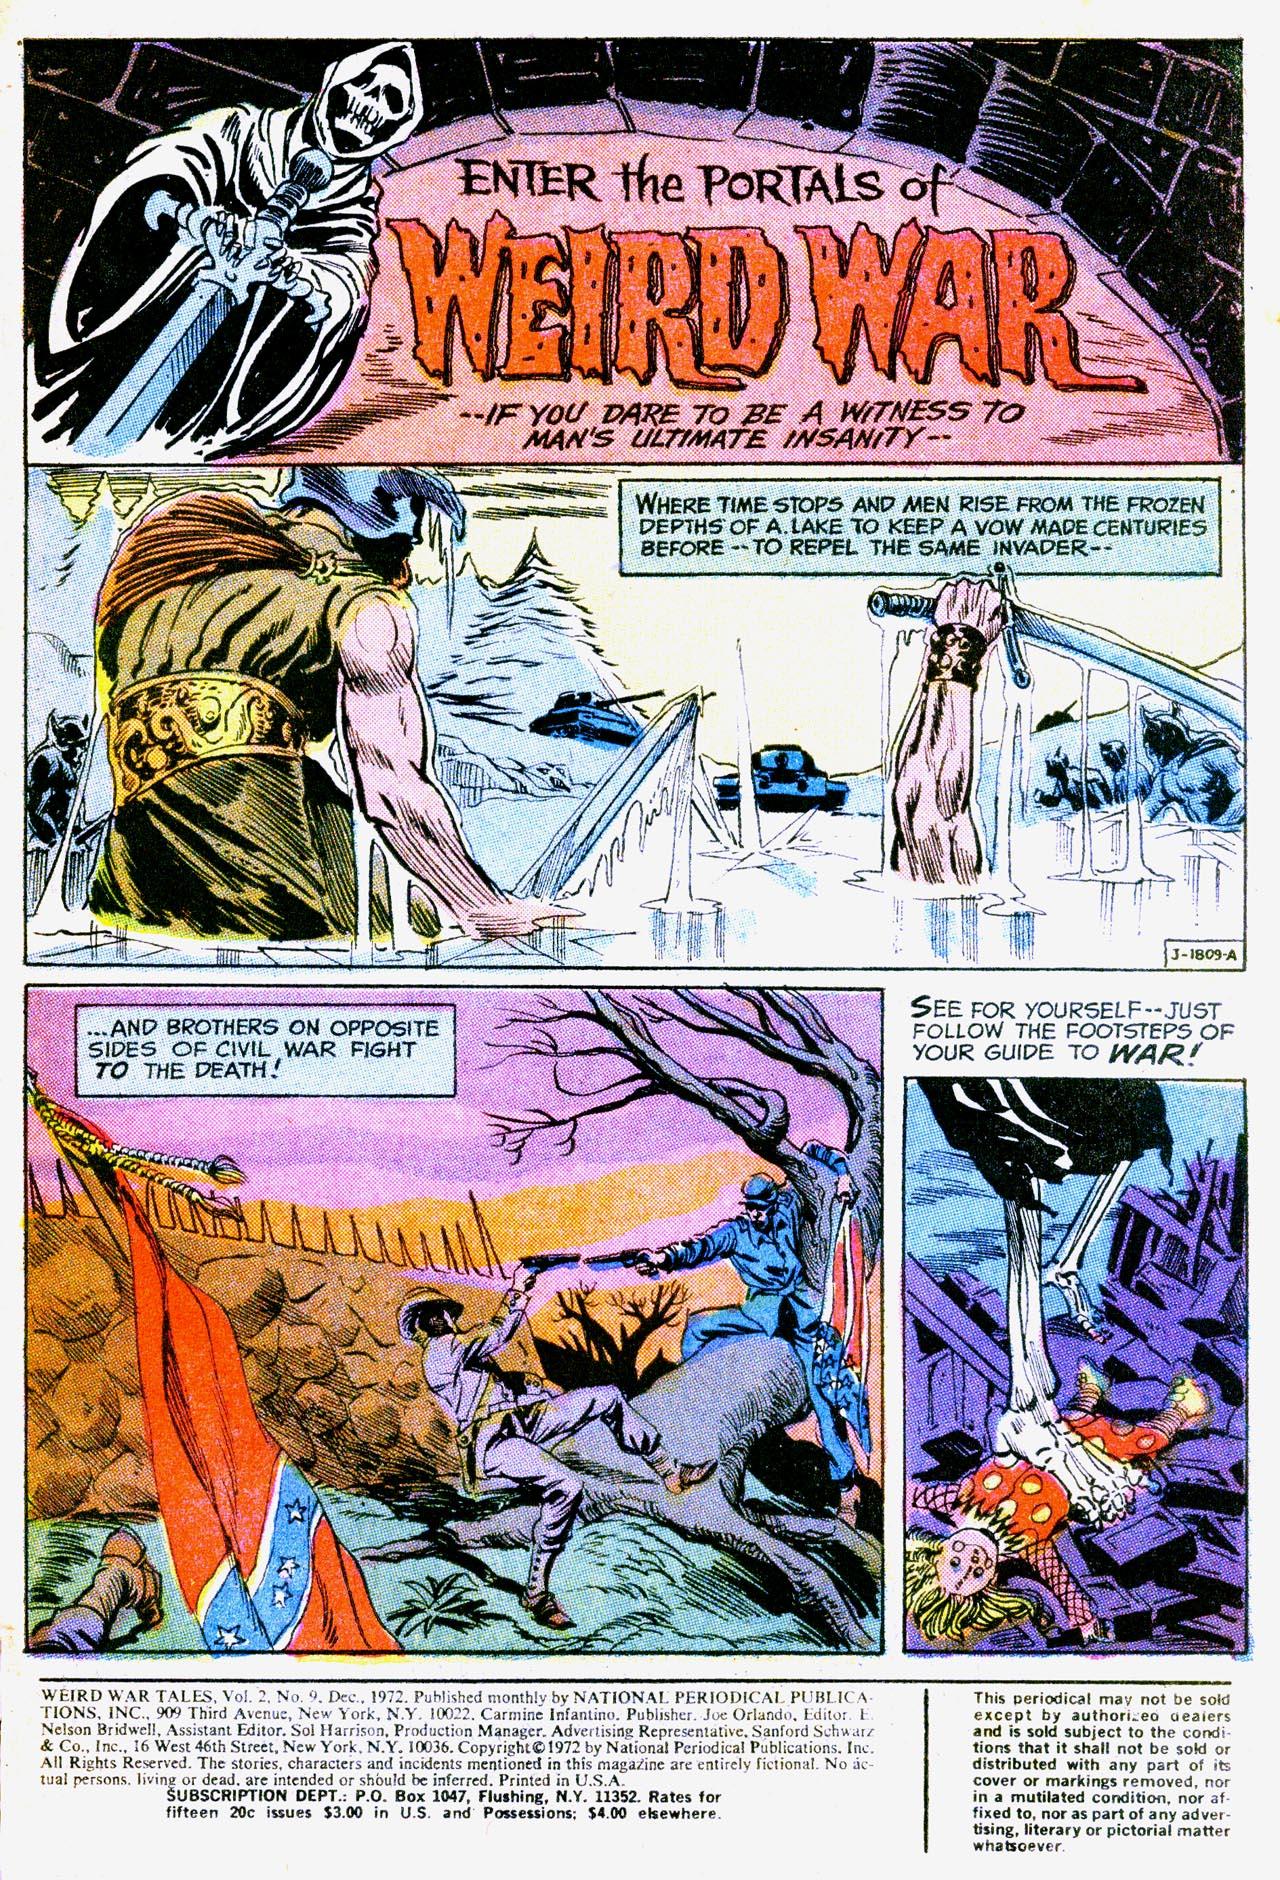 Weird War Tales (1971) #9 pg1, art by Howard Chaykin.